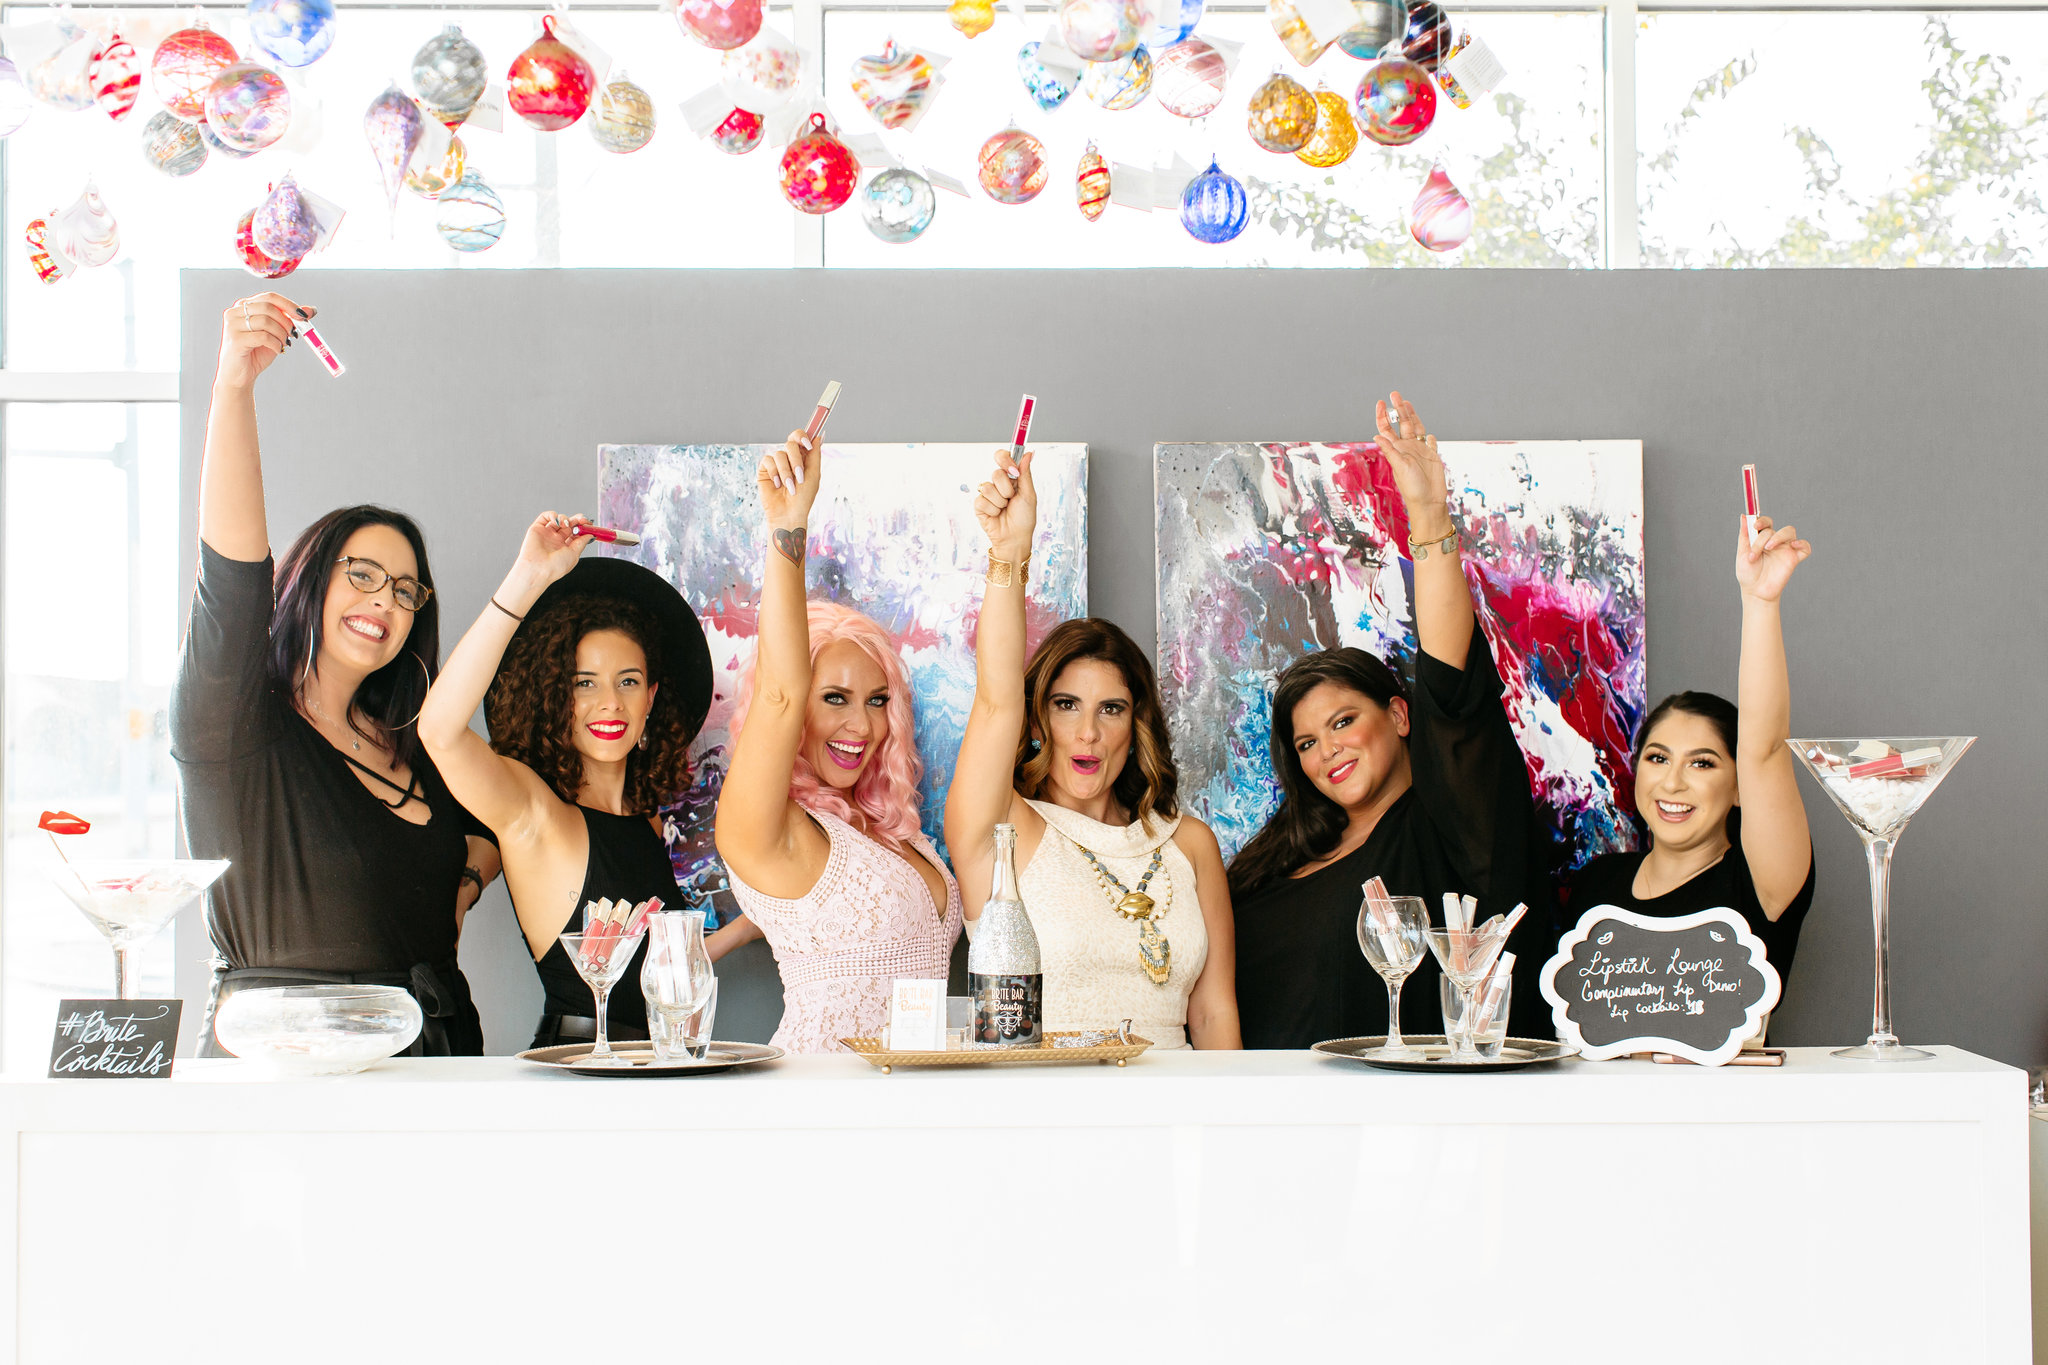 Alexa-Vossler-Photo_Dallas-Event-Photographer_Brite-Bar-Beauty-2018-Lipstick-Launch-Party-128.jpg